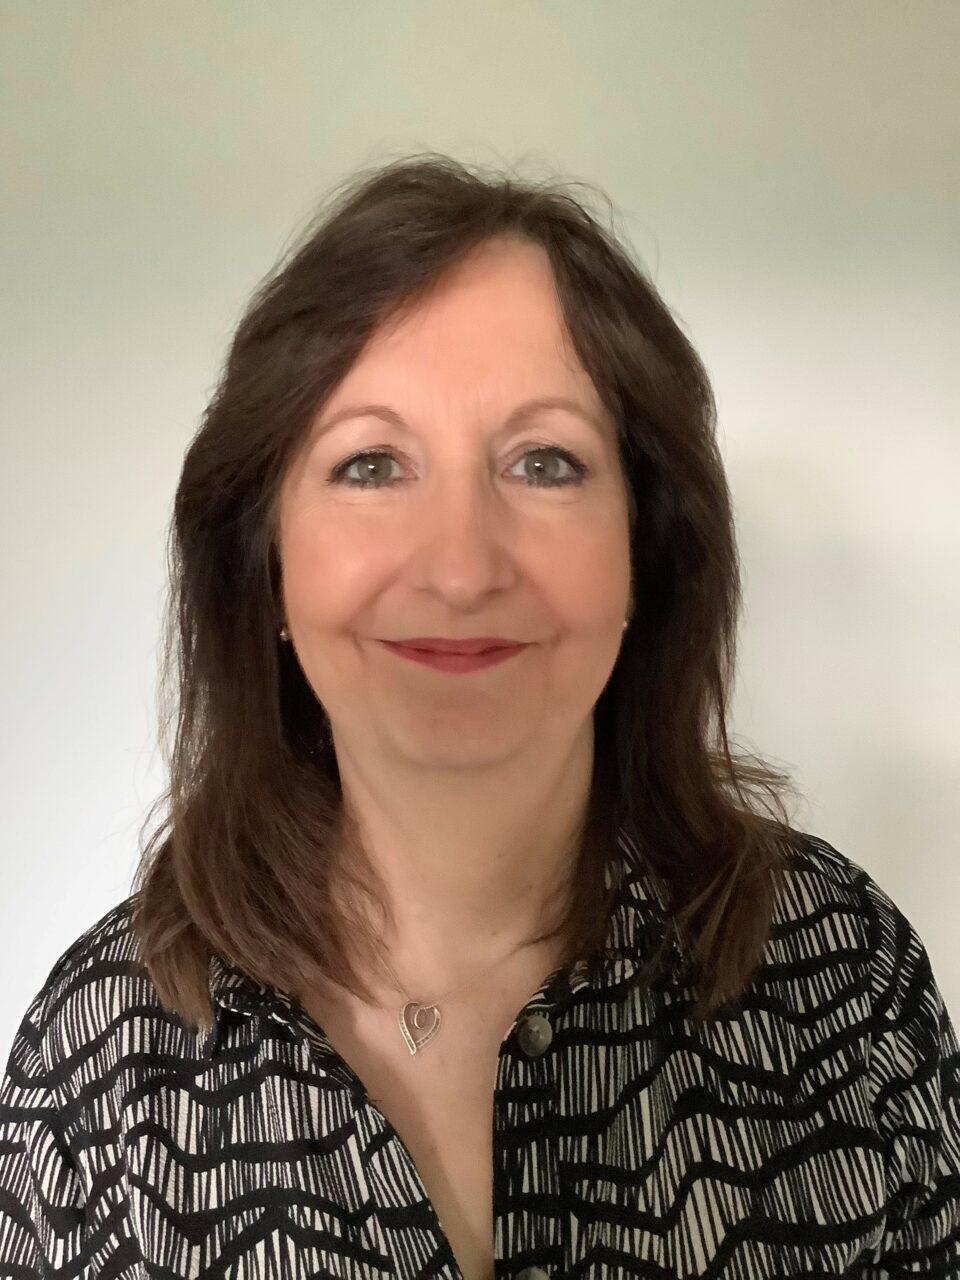 NHBC - Kim Carter, Head of Claims Consumer Strategy